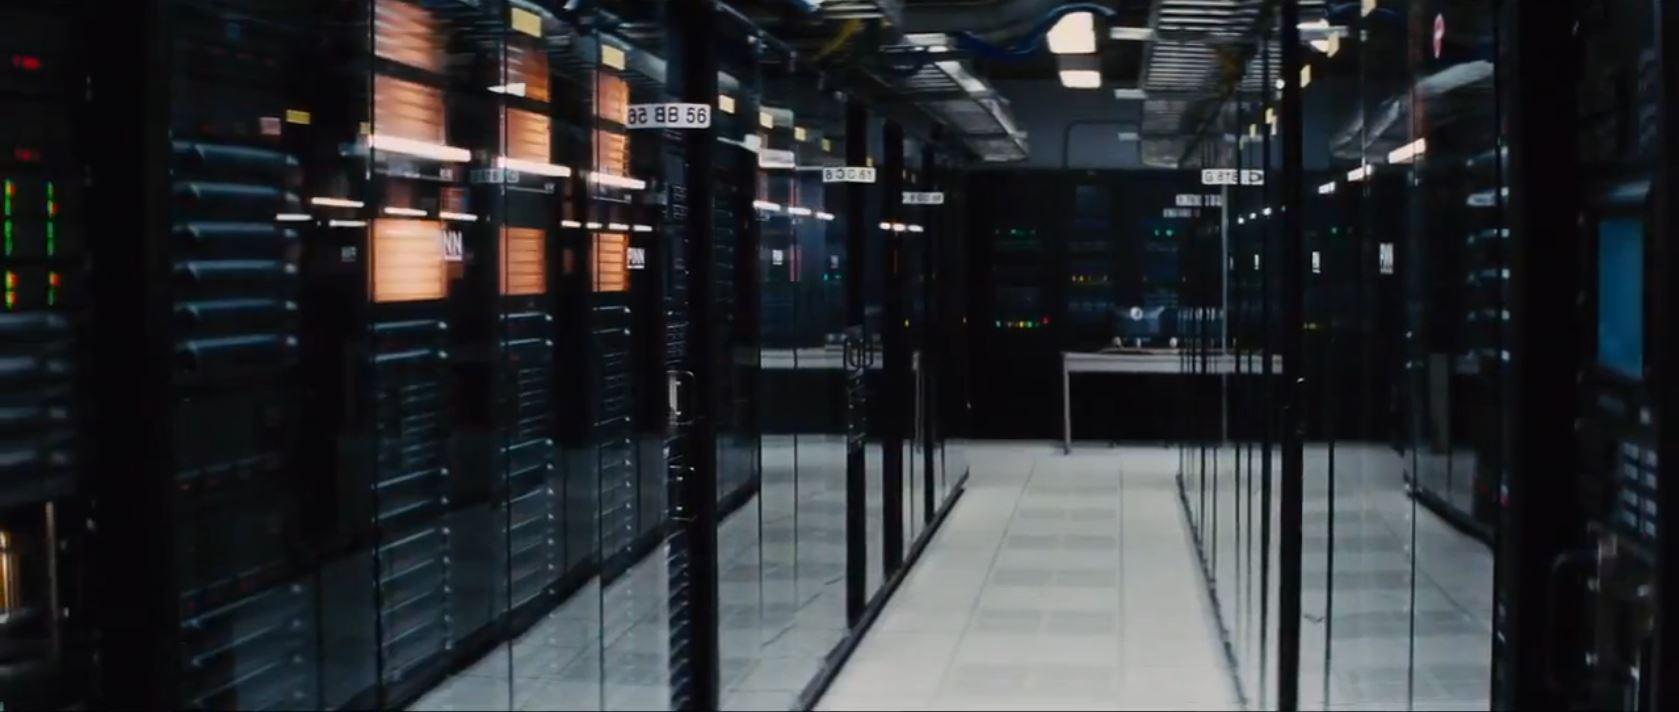 transcendence movie - the machine